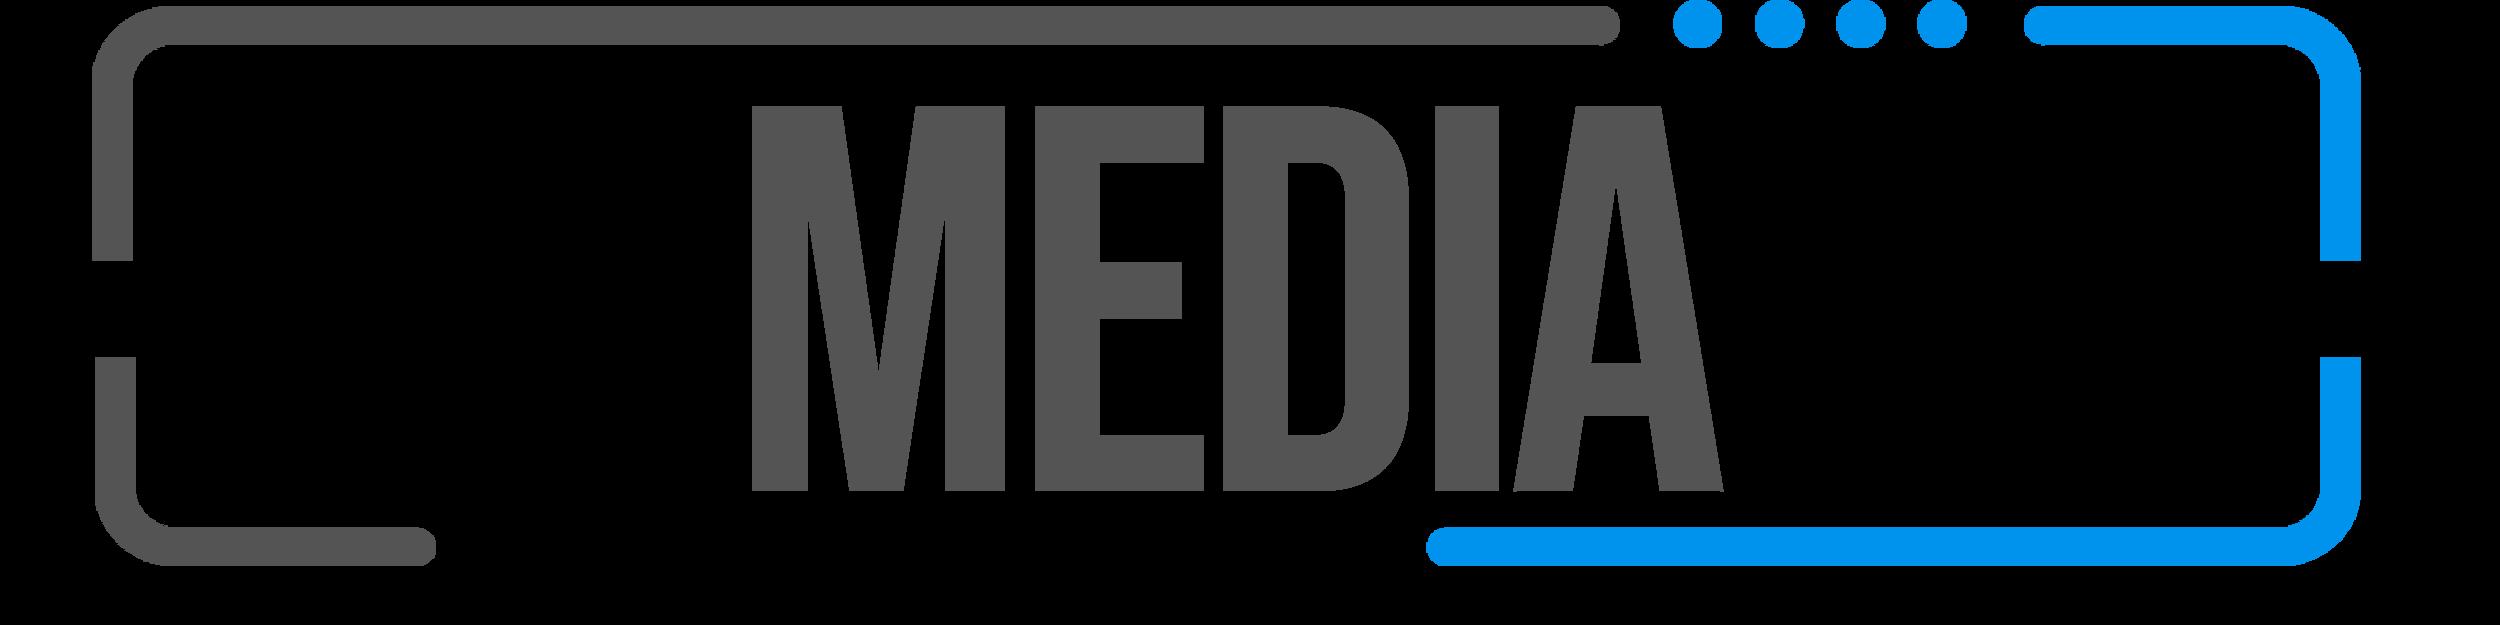 MediaTitleGraphic.png